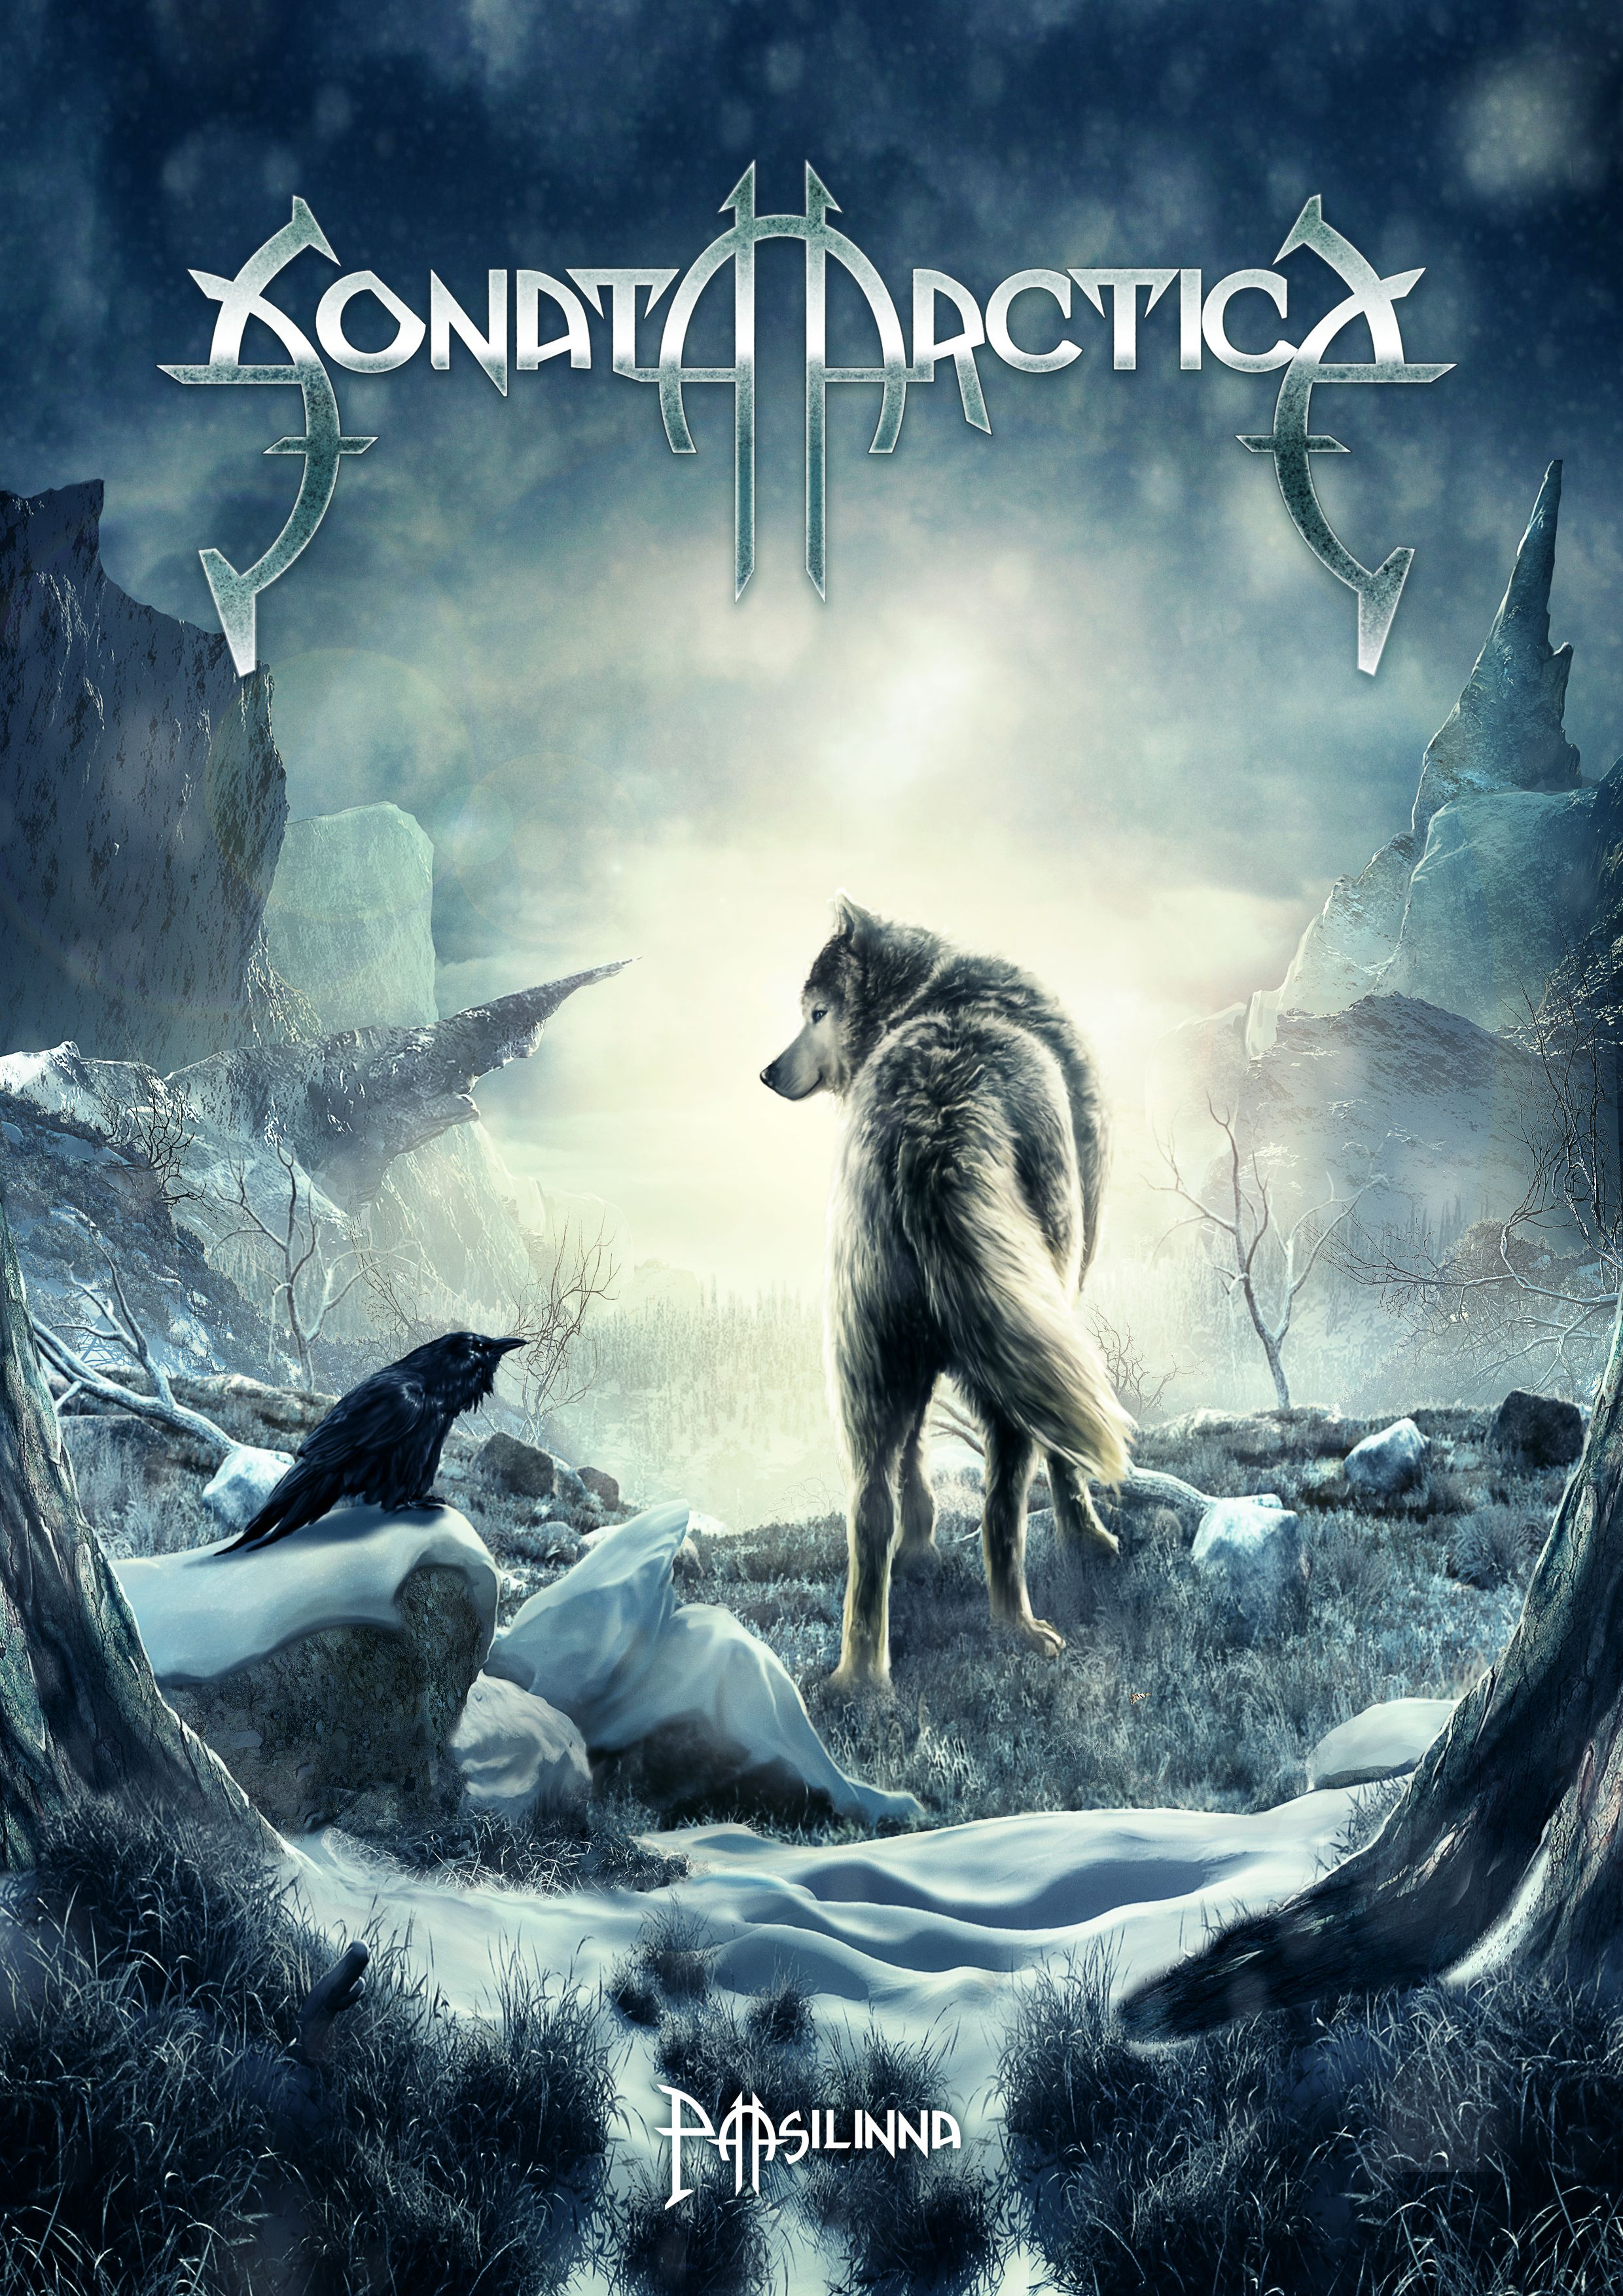 musicas sonata arctica